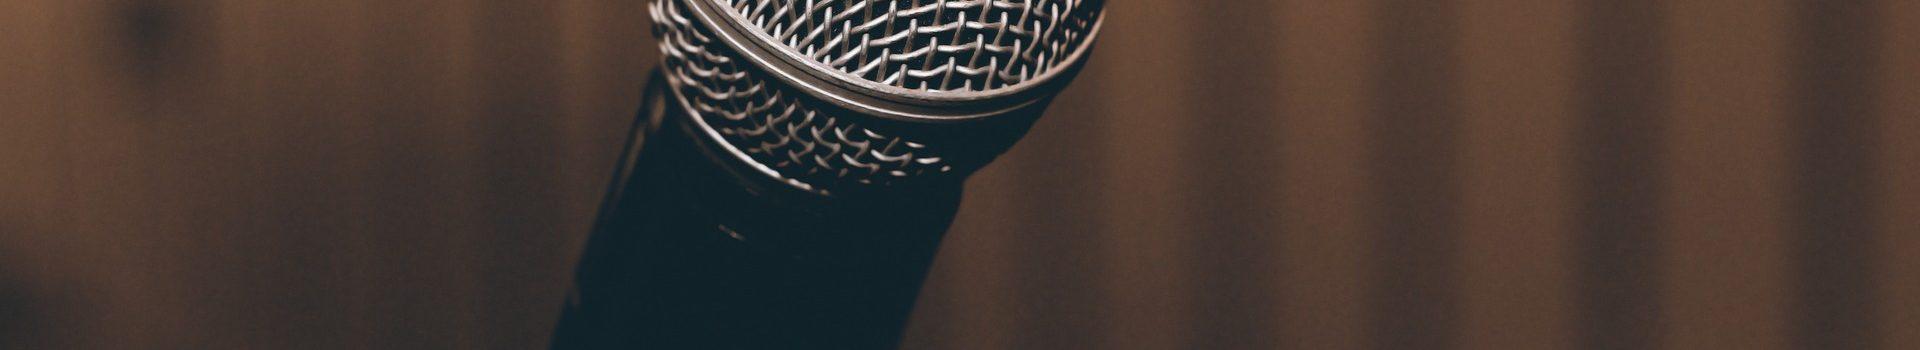 microphone-1206362_1920